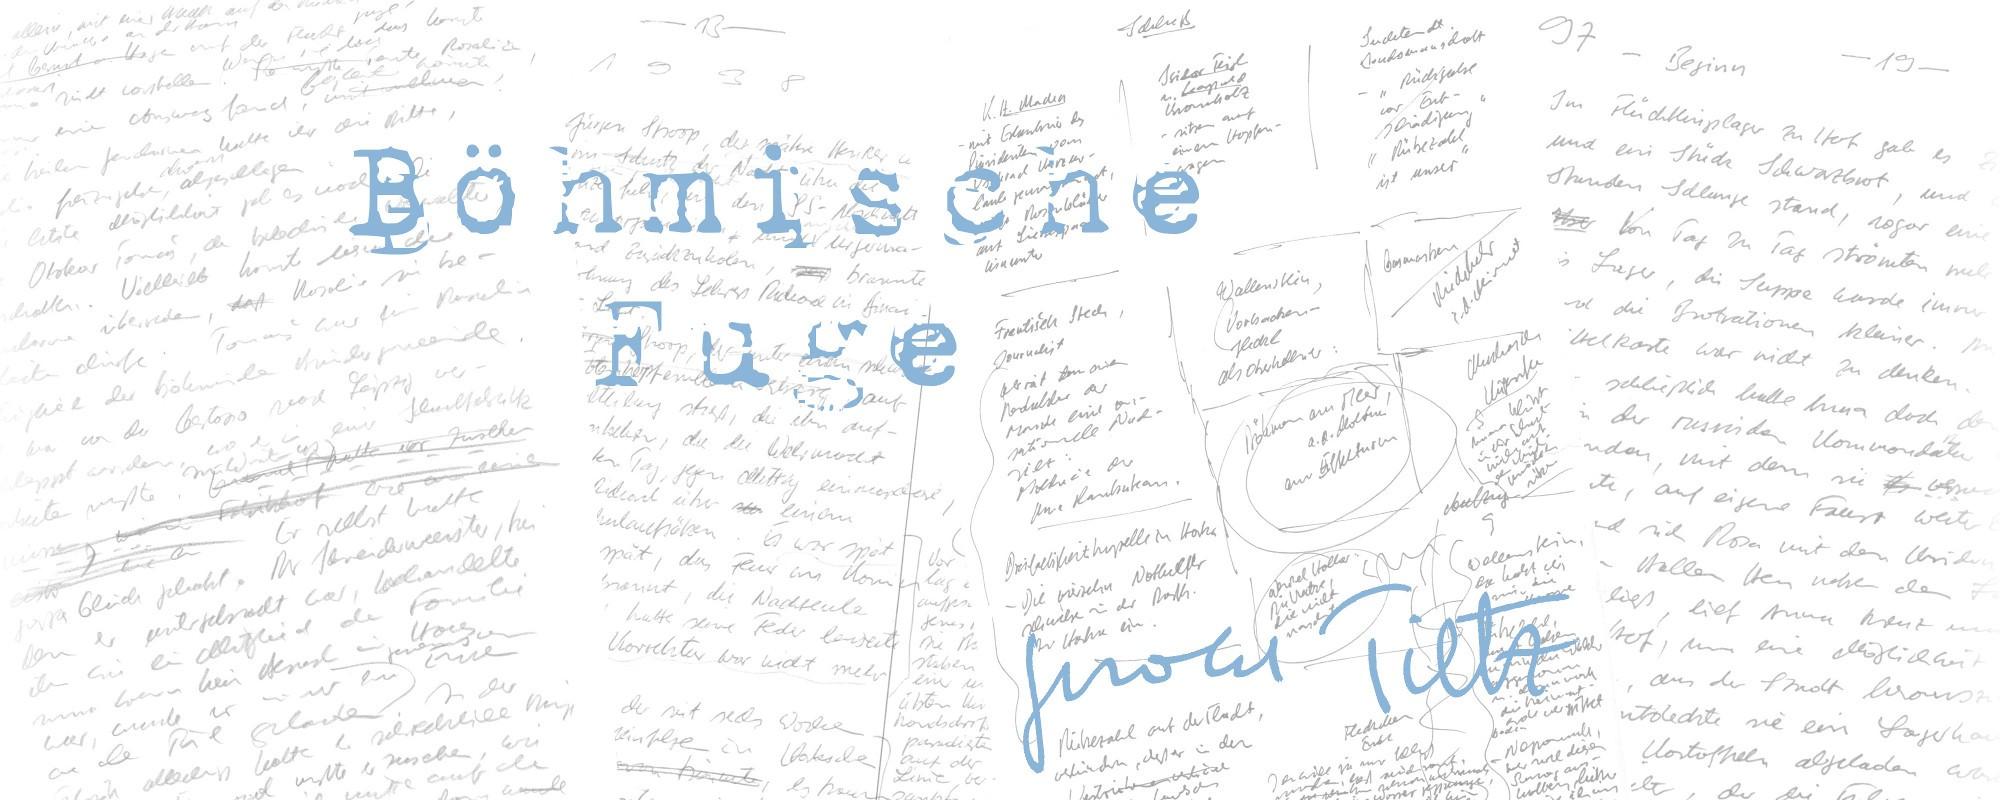 Gerold-Tietz-Boehmische-Fuge-Schriftbild